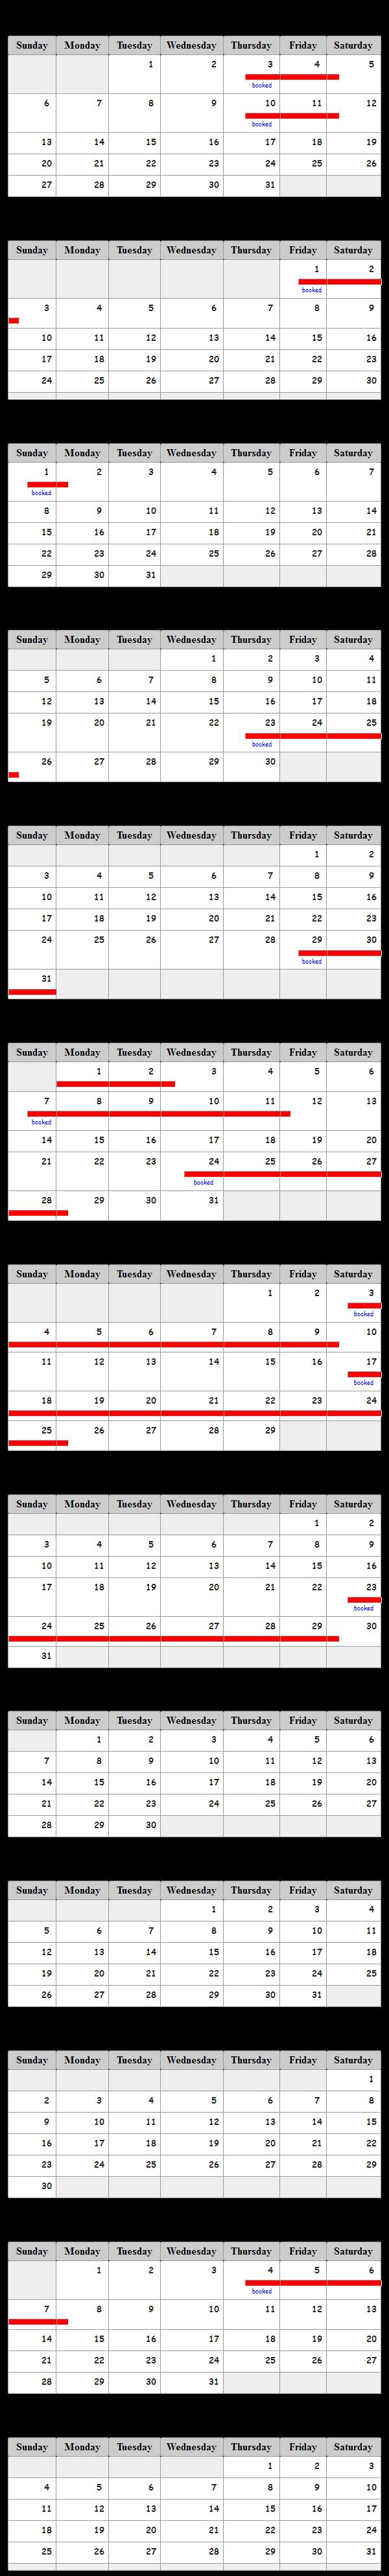 Ski Silverthorne Lodge 30A Availability Calendar